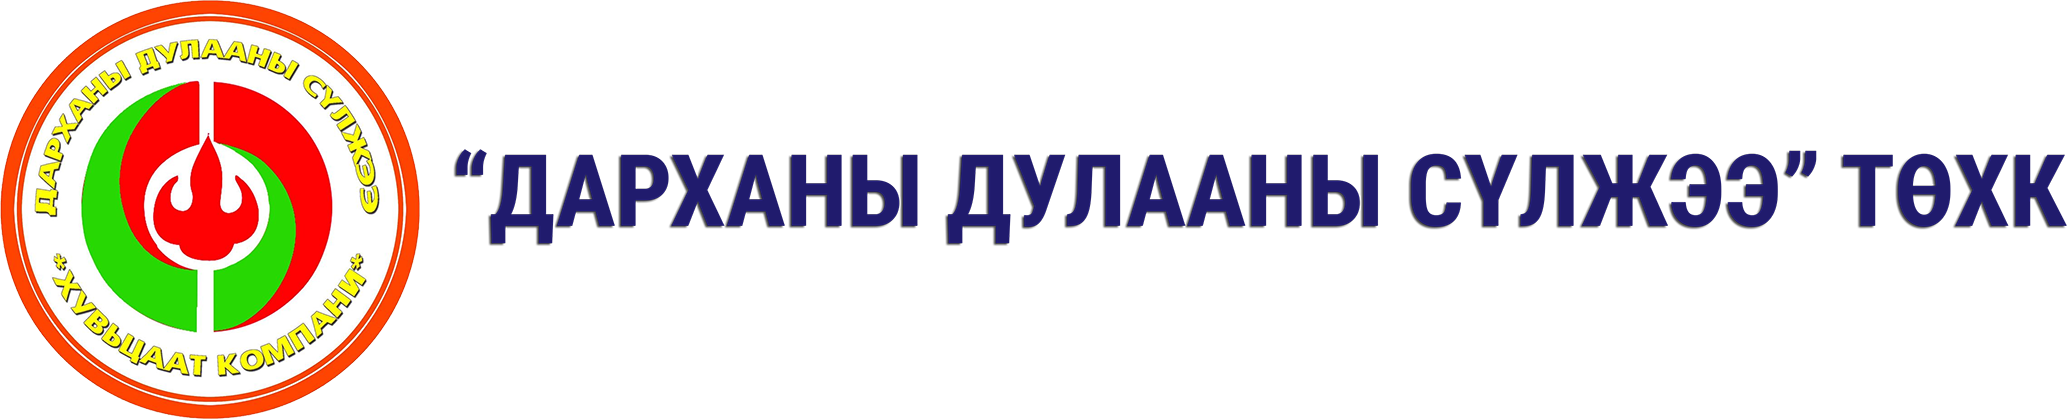 """Дарханы Дулааны сүлжээ"" ТӨХК"